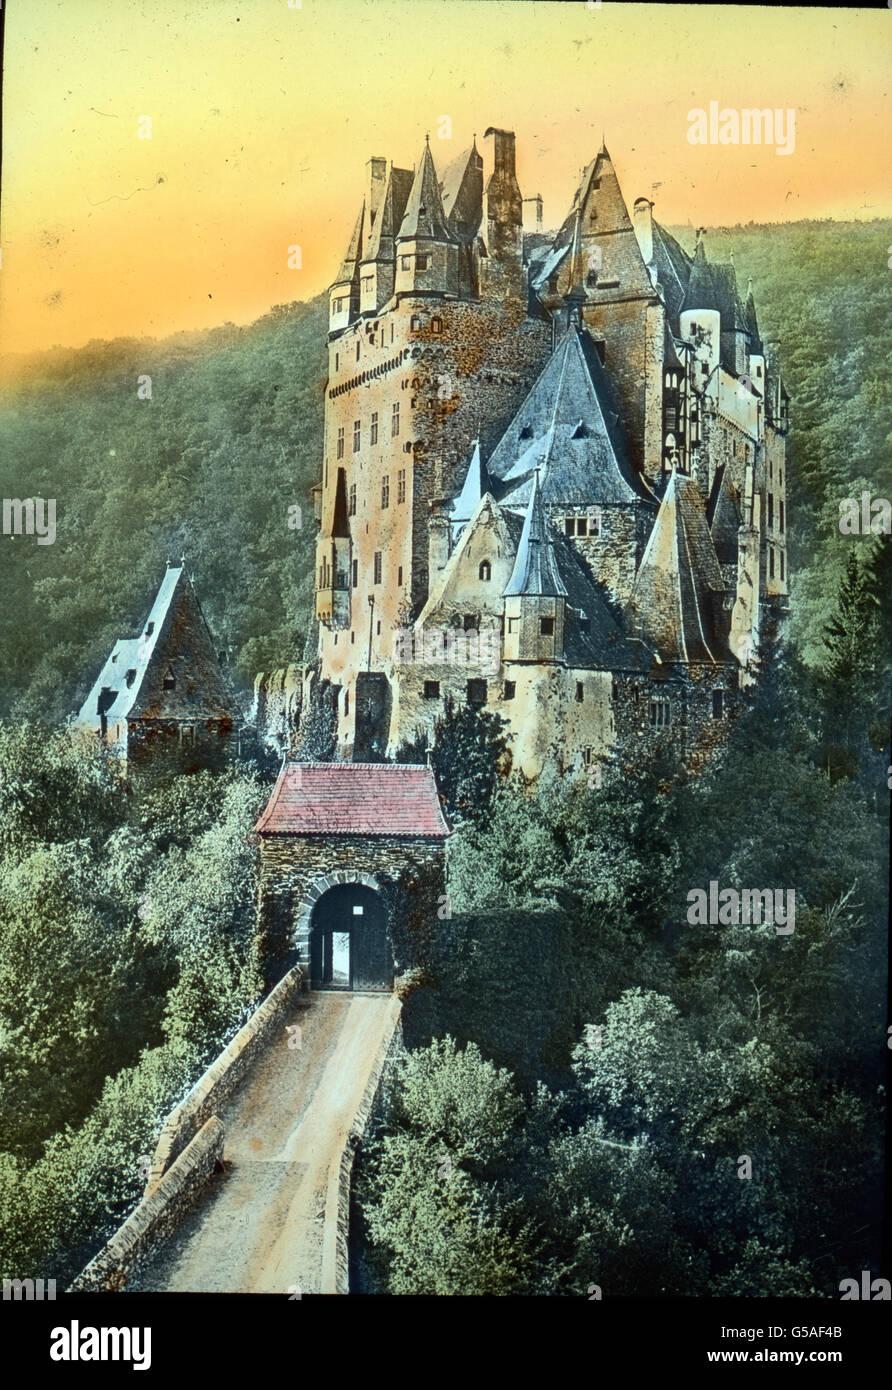 Die Burg Eltz. Germany, 1910s, 1920s, 20th century, archive, Carl Simon, travel, history, historical, castle, architecture, - Stock Image